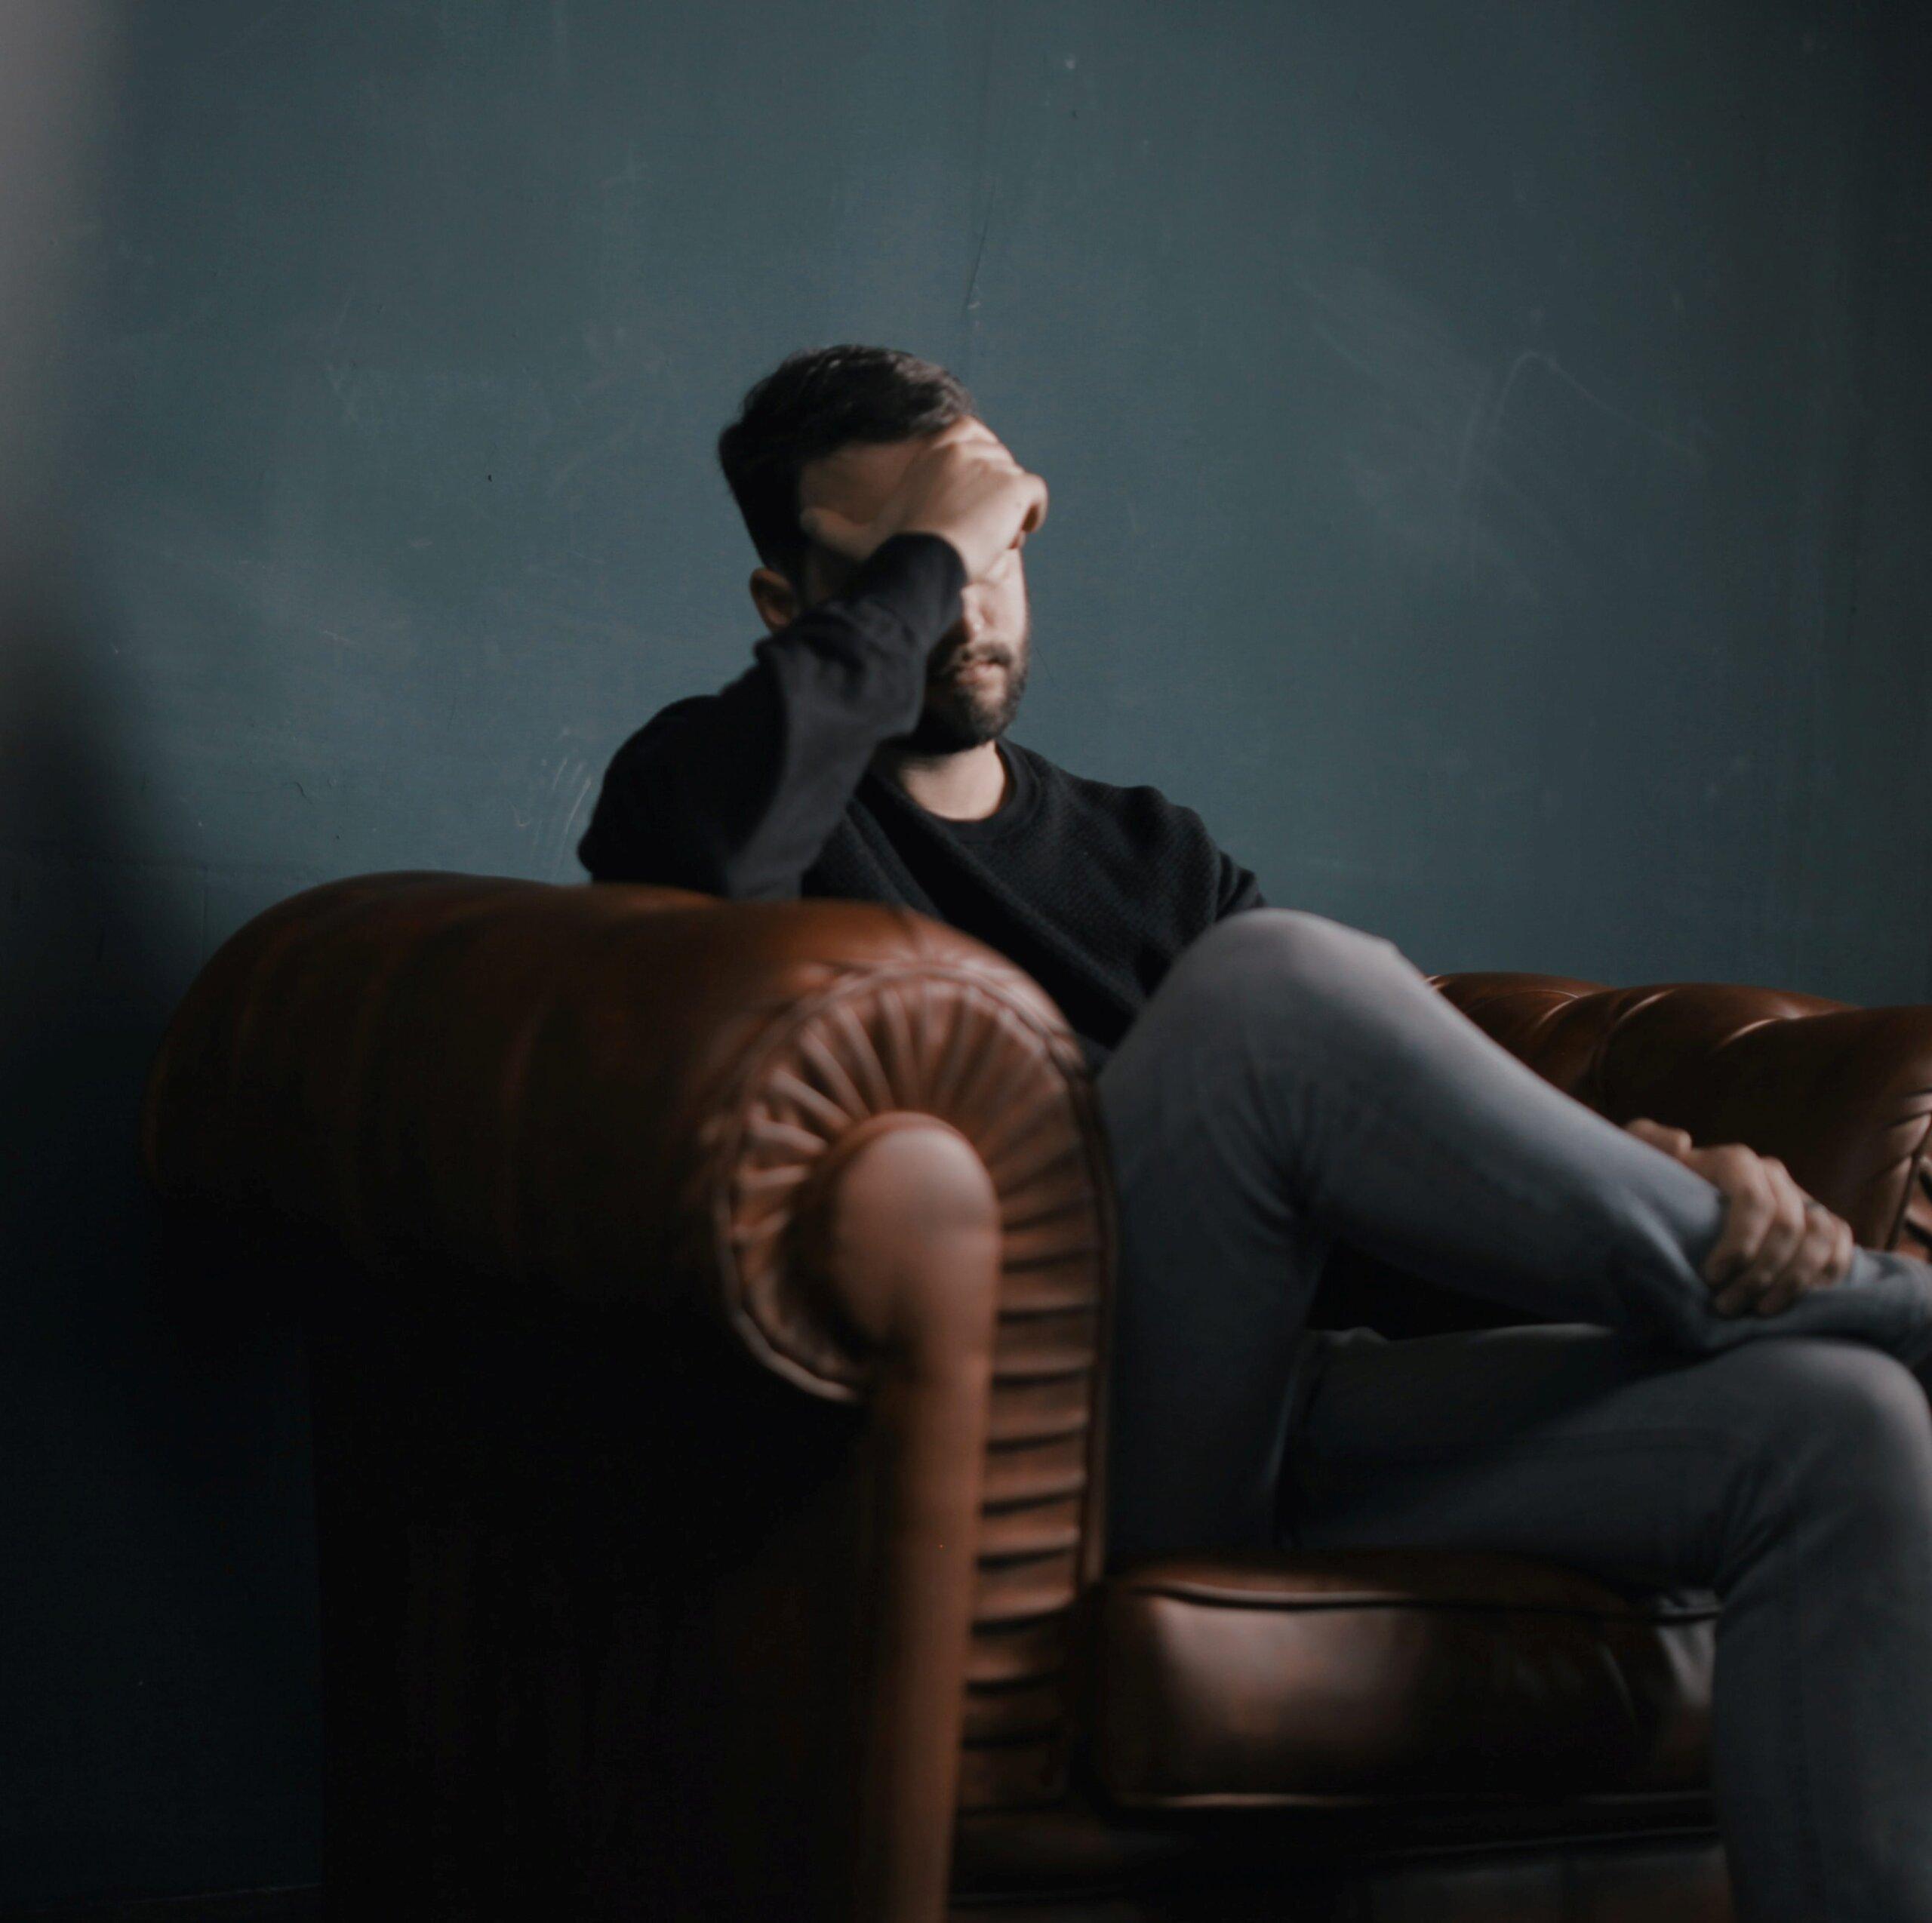 depressed, hopeless man